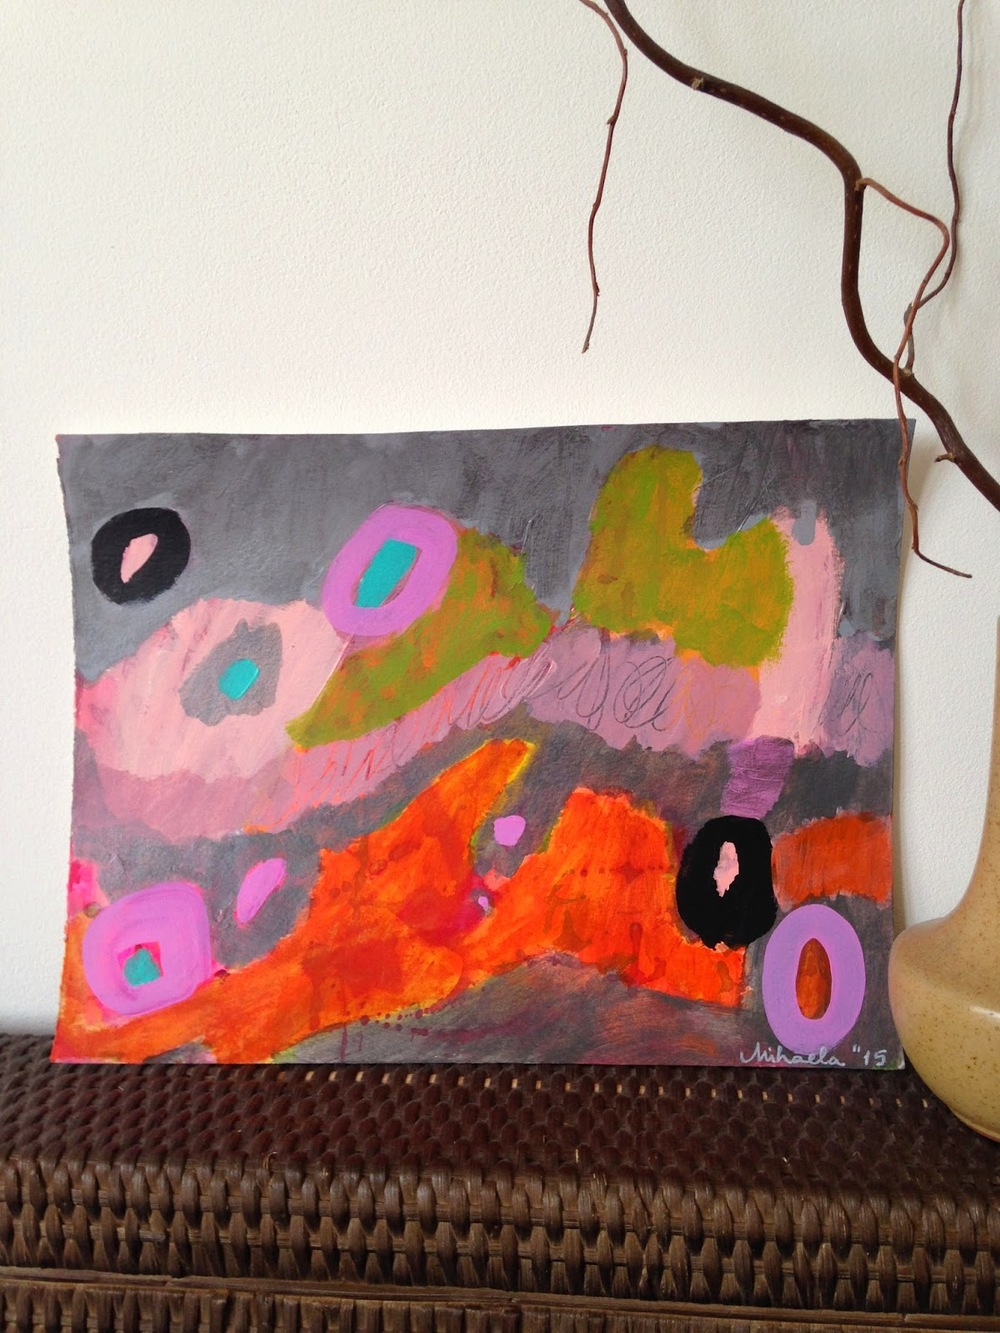 Magma, 32.5 X 25 cm, acrylic on paper